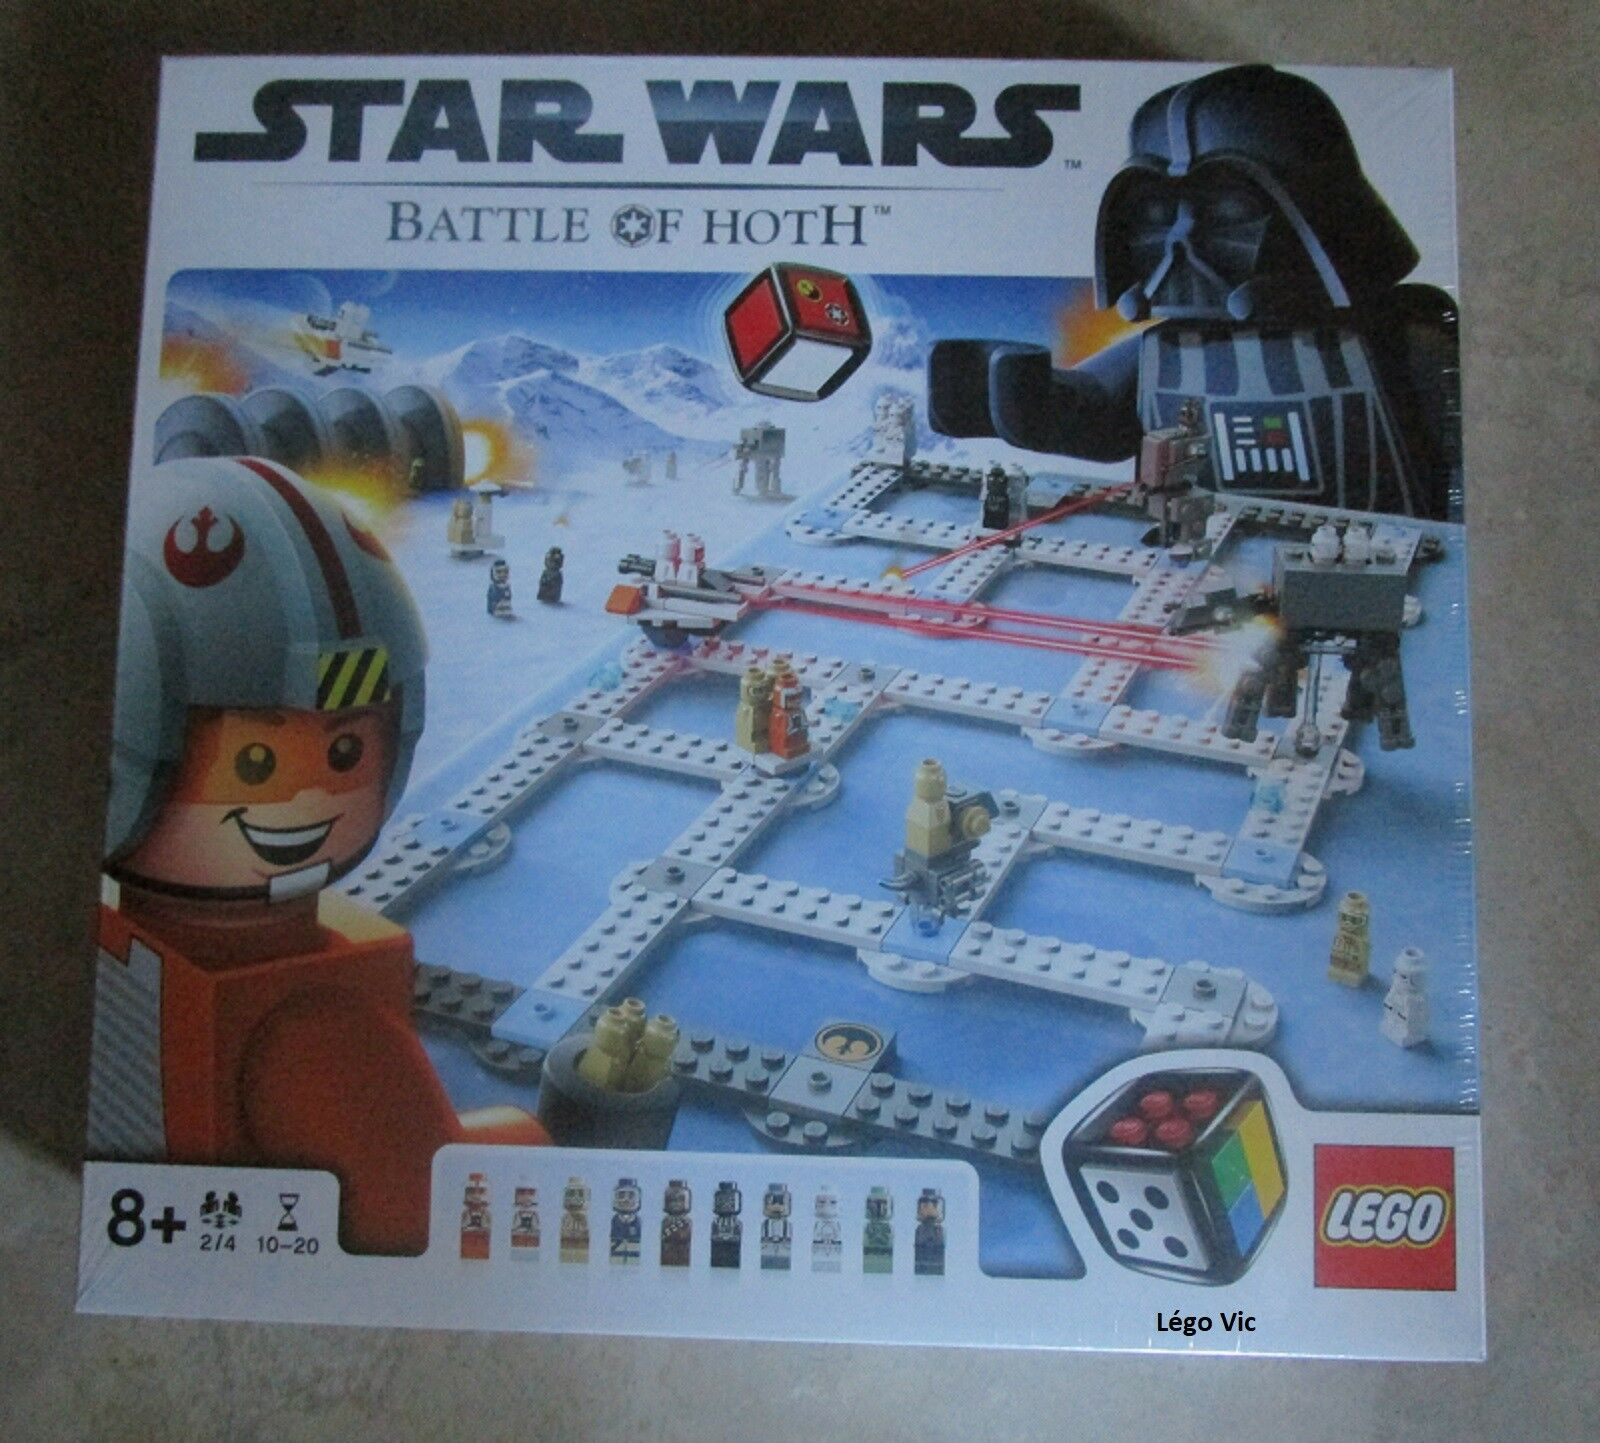 Lego 3866 Star Wars Battle of Hoth jeux de société New Neuf -CNB50 rare